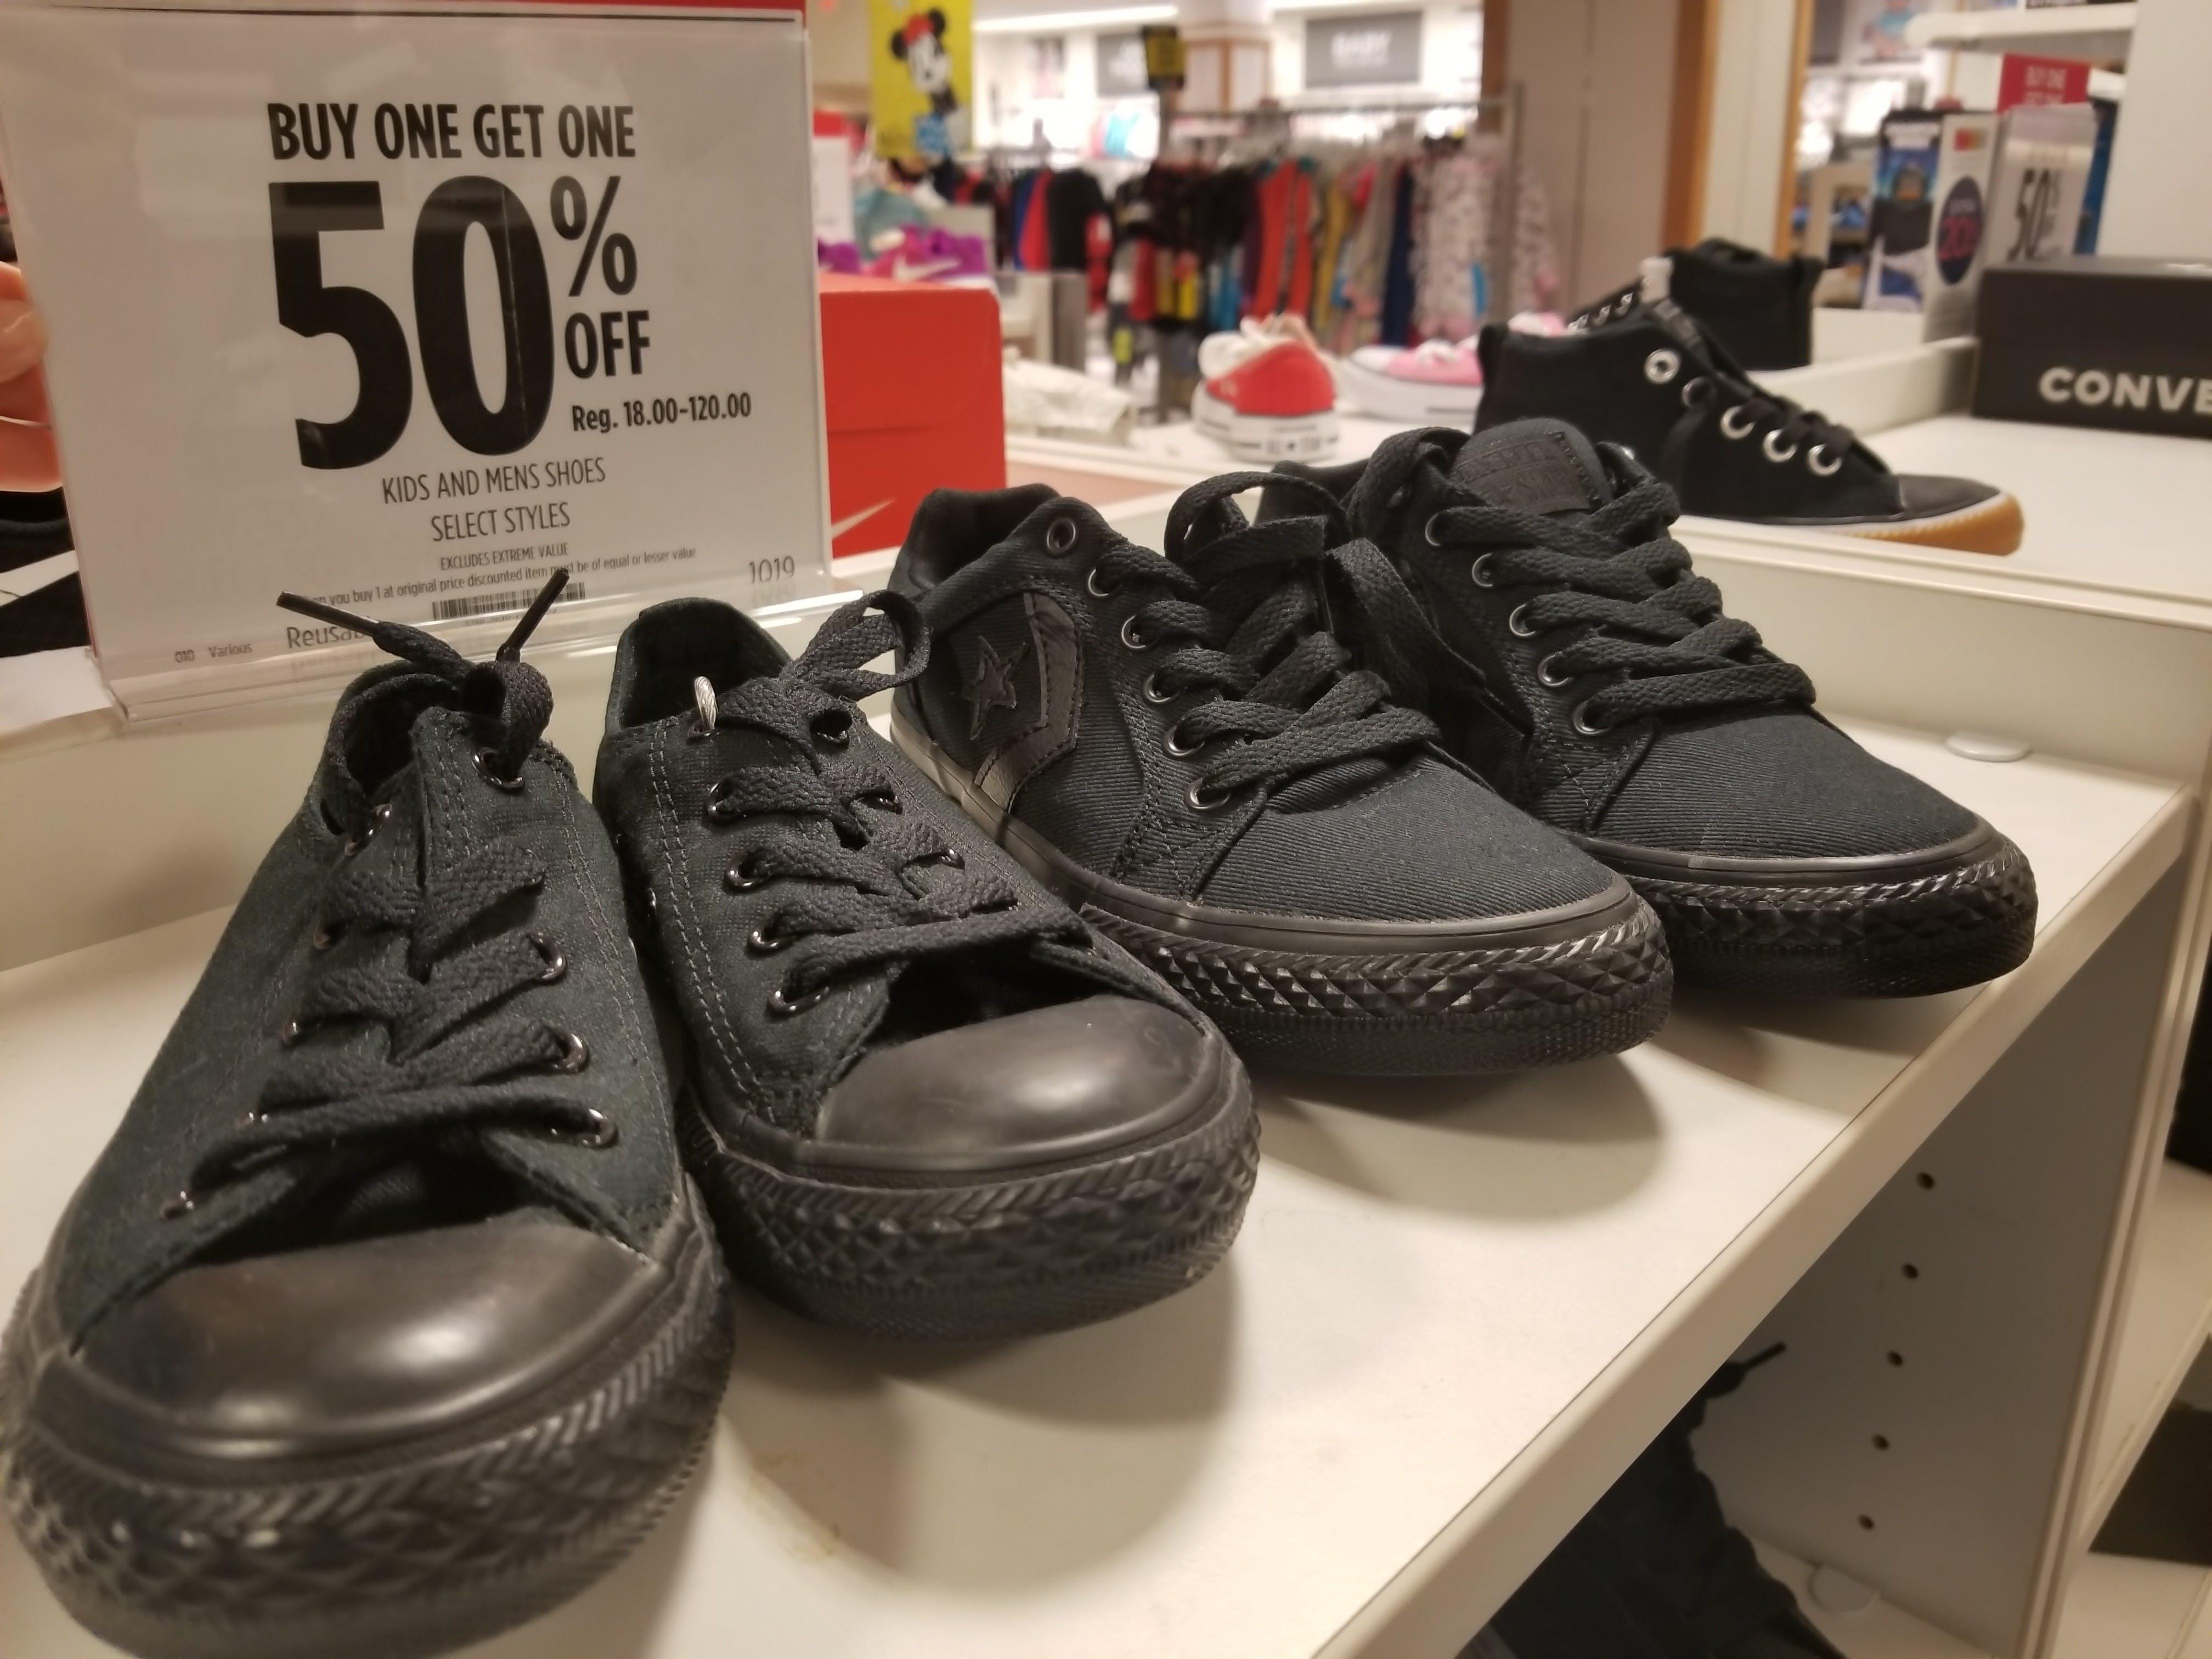 $25 Vans and BOGO 50% Off Converse at